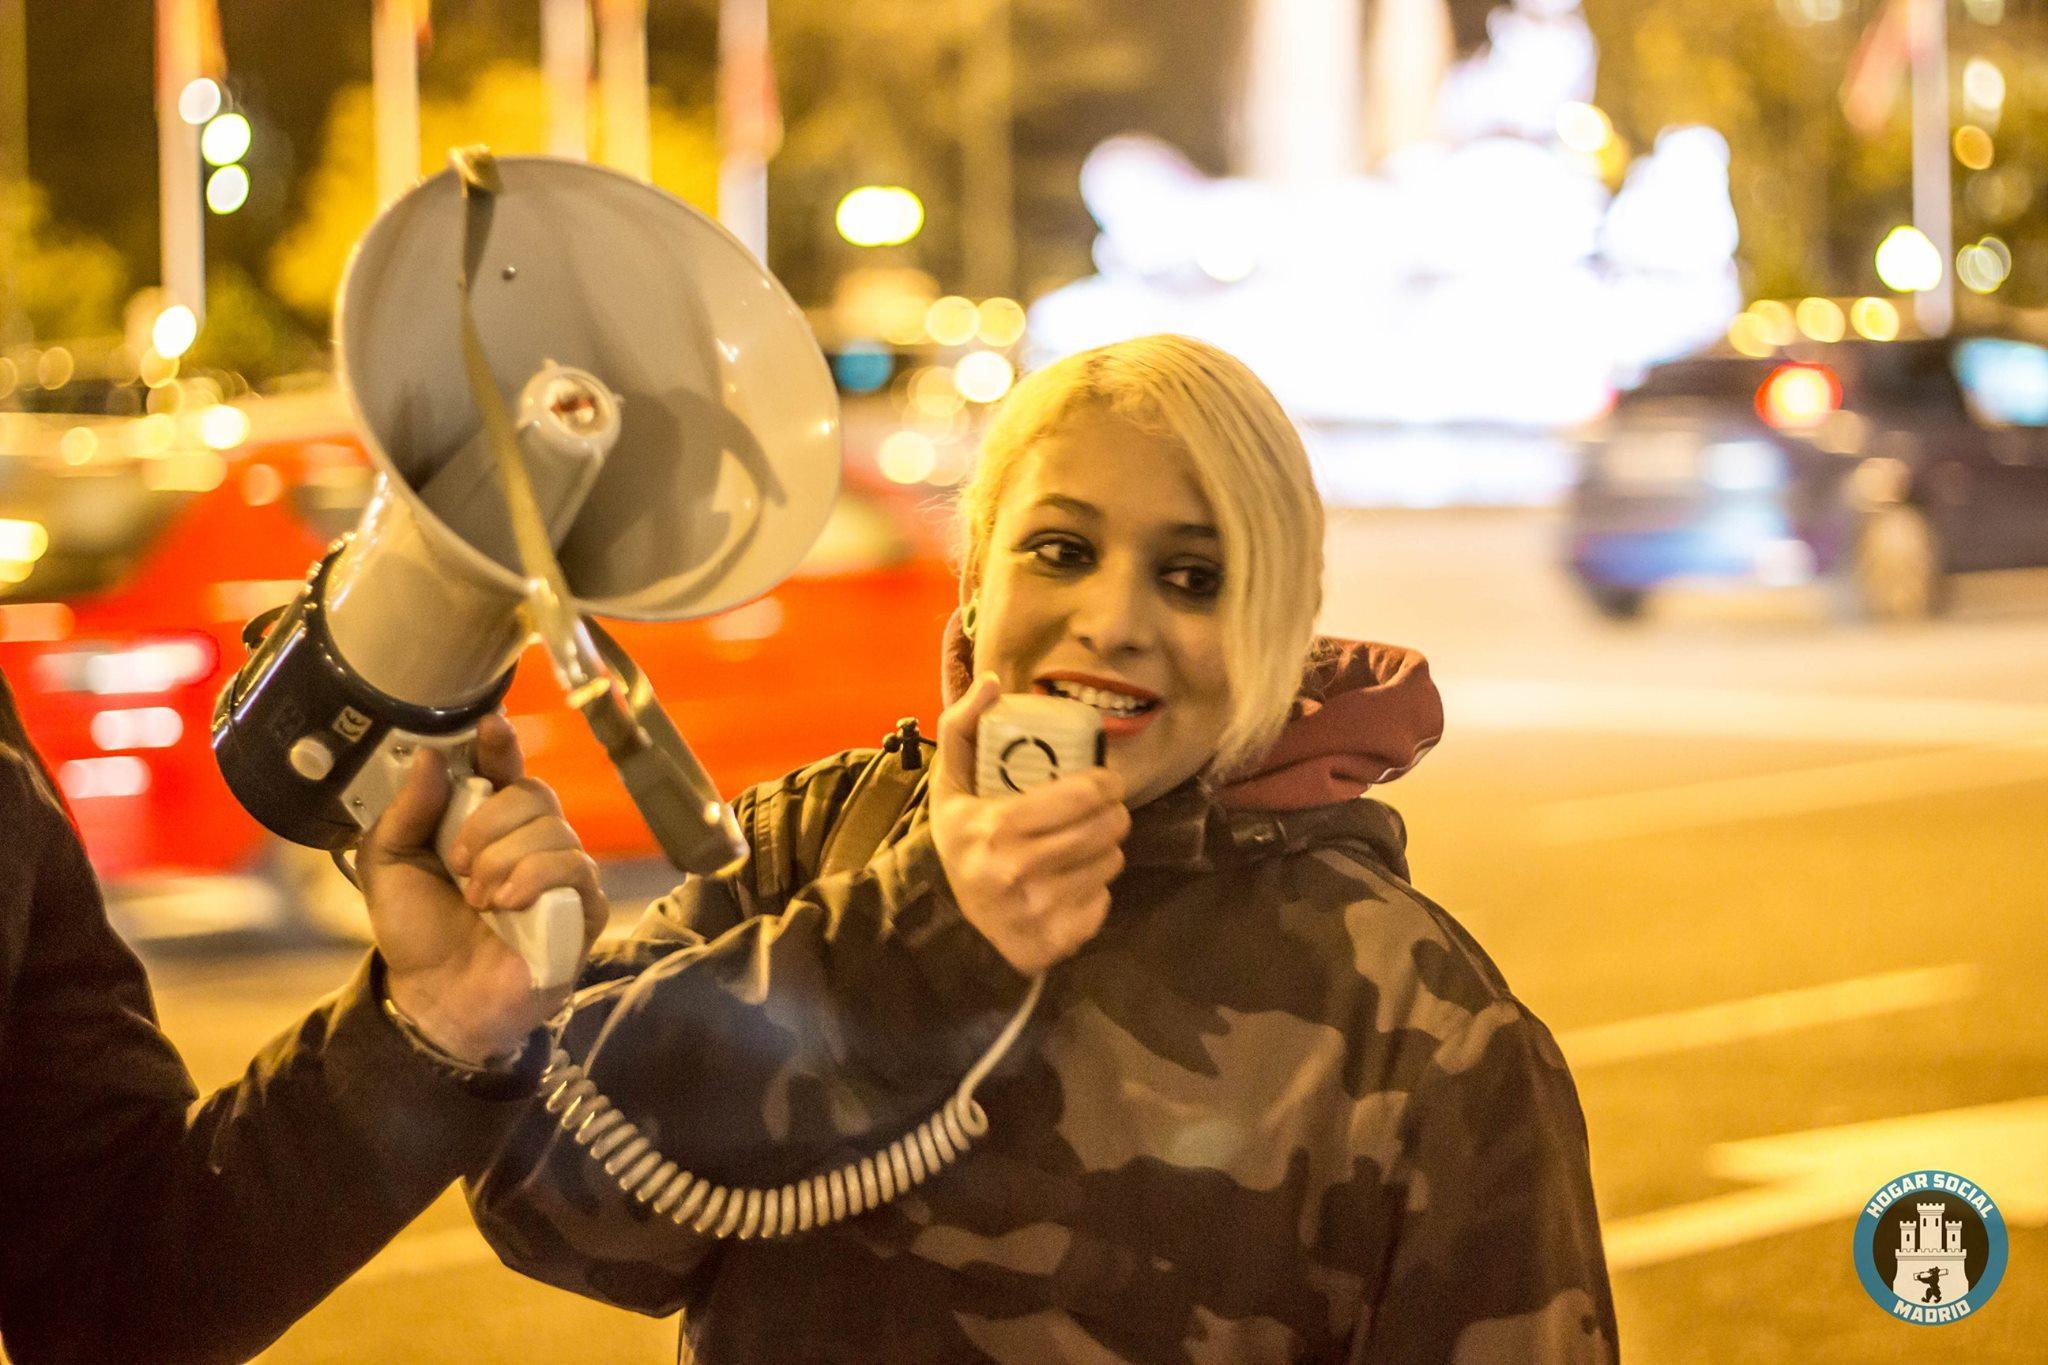 Melisa Lider De Hogar Social Madrid Entre Vox Y Podemos No Se